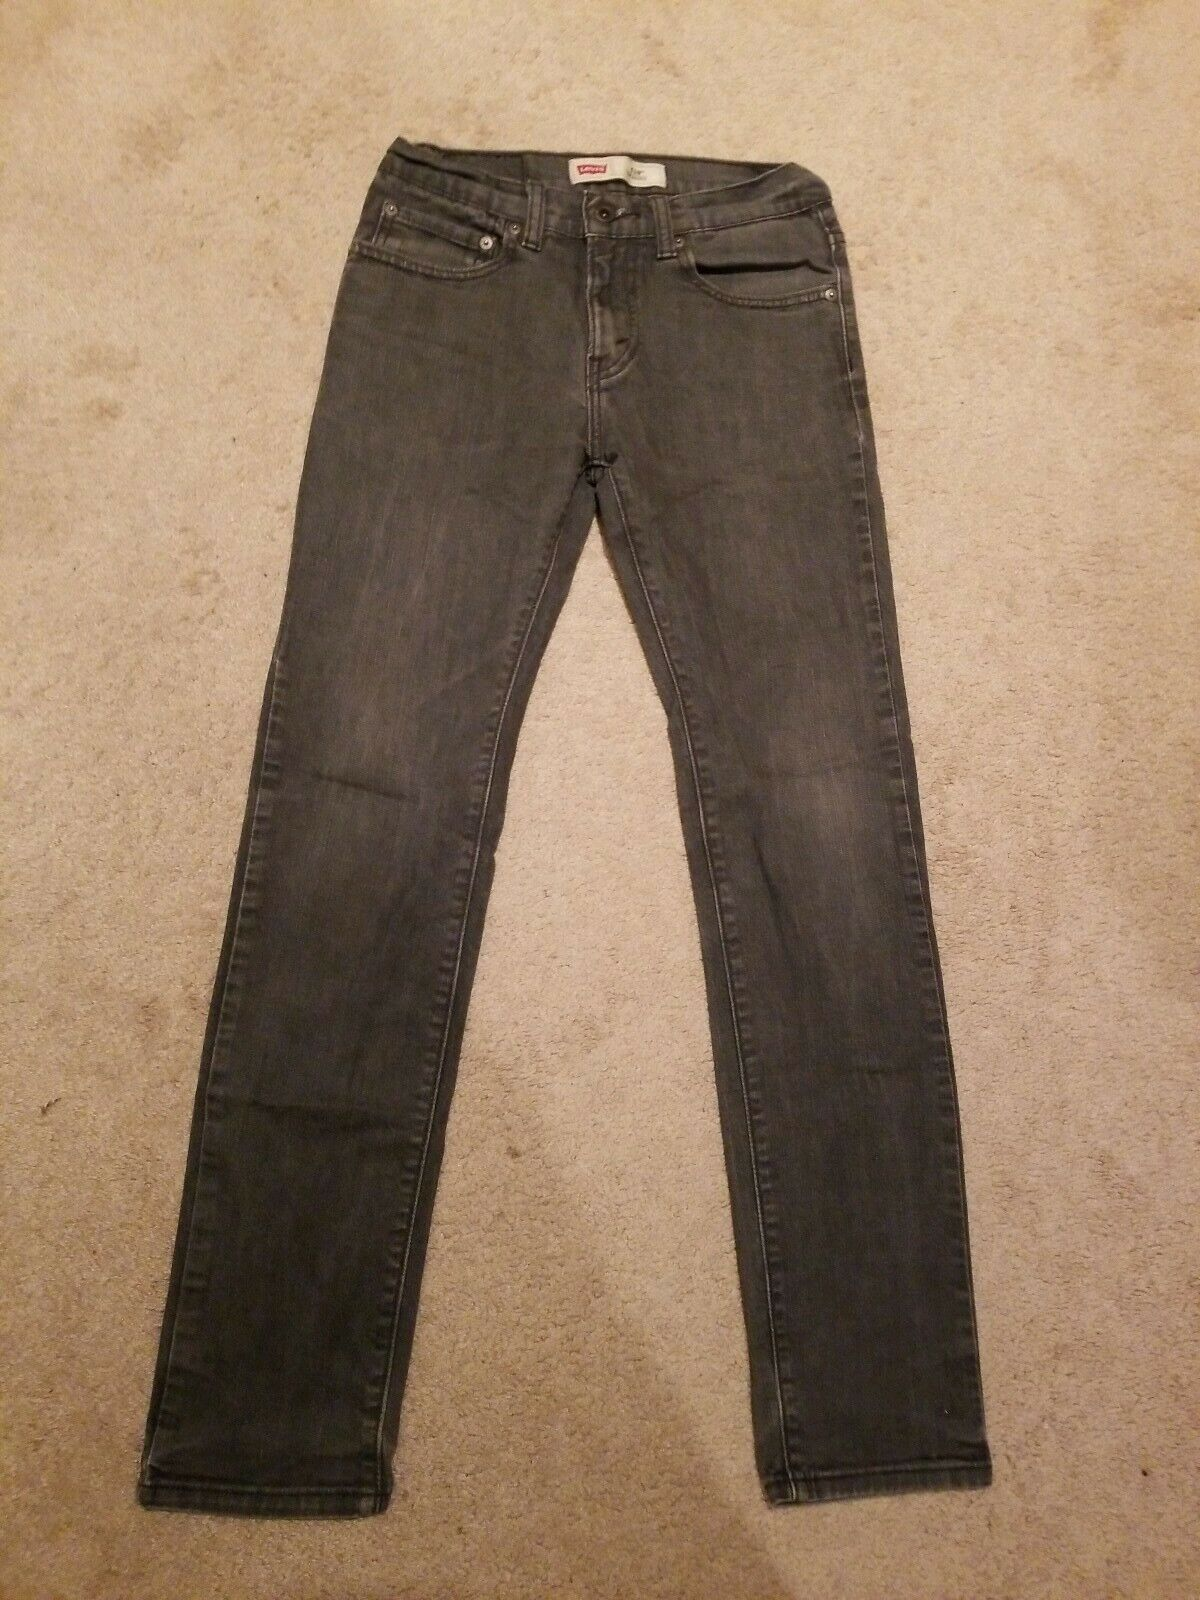 Levi/'s 505 Regular Youth Denim Jeans Size 18 Reg W29 L29 Cotton